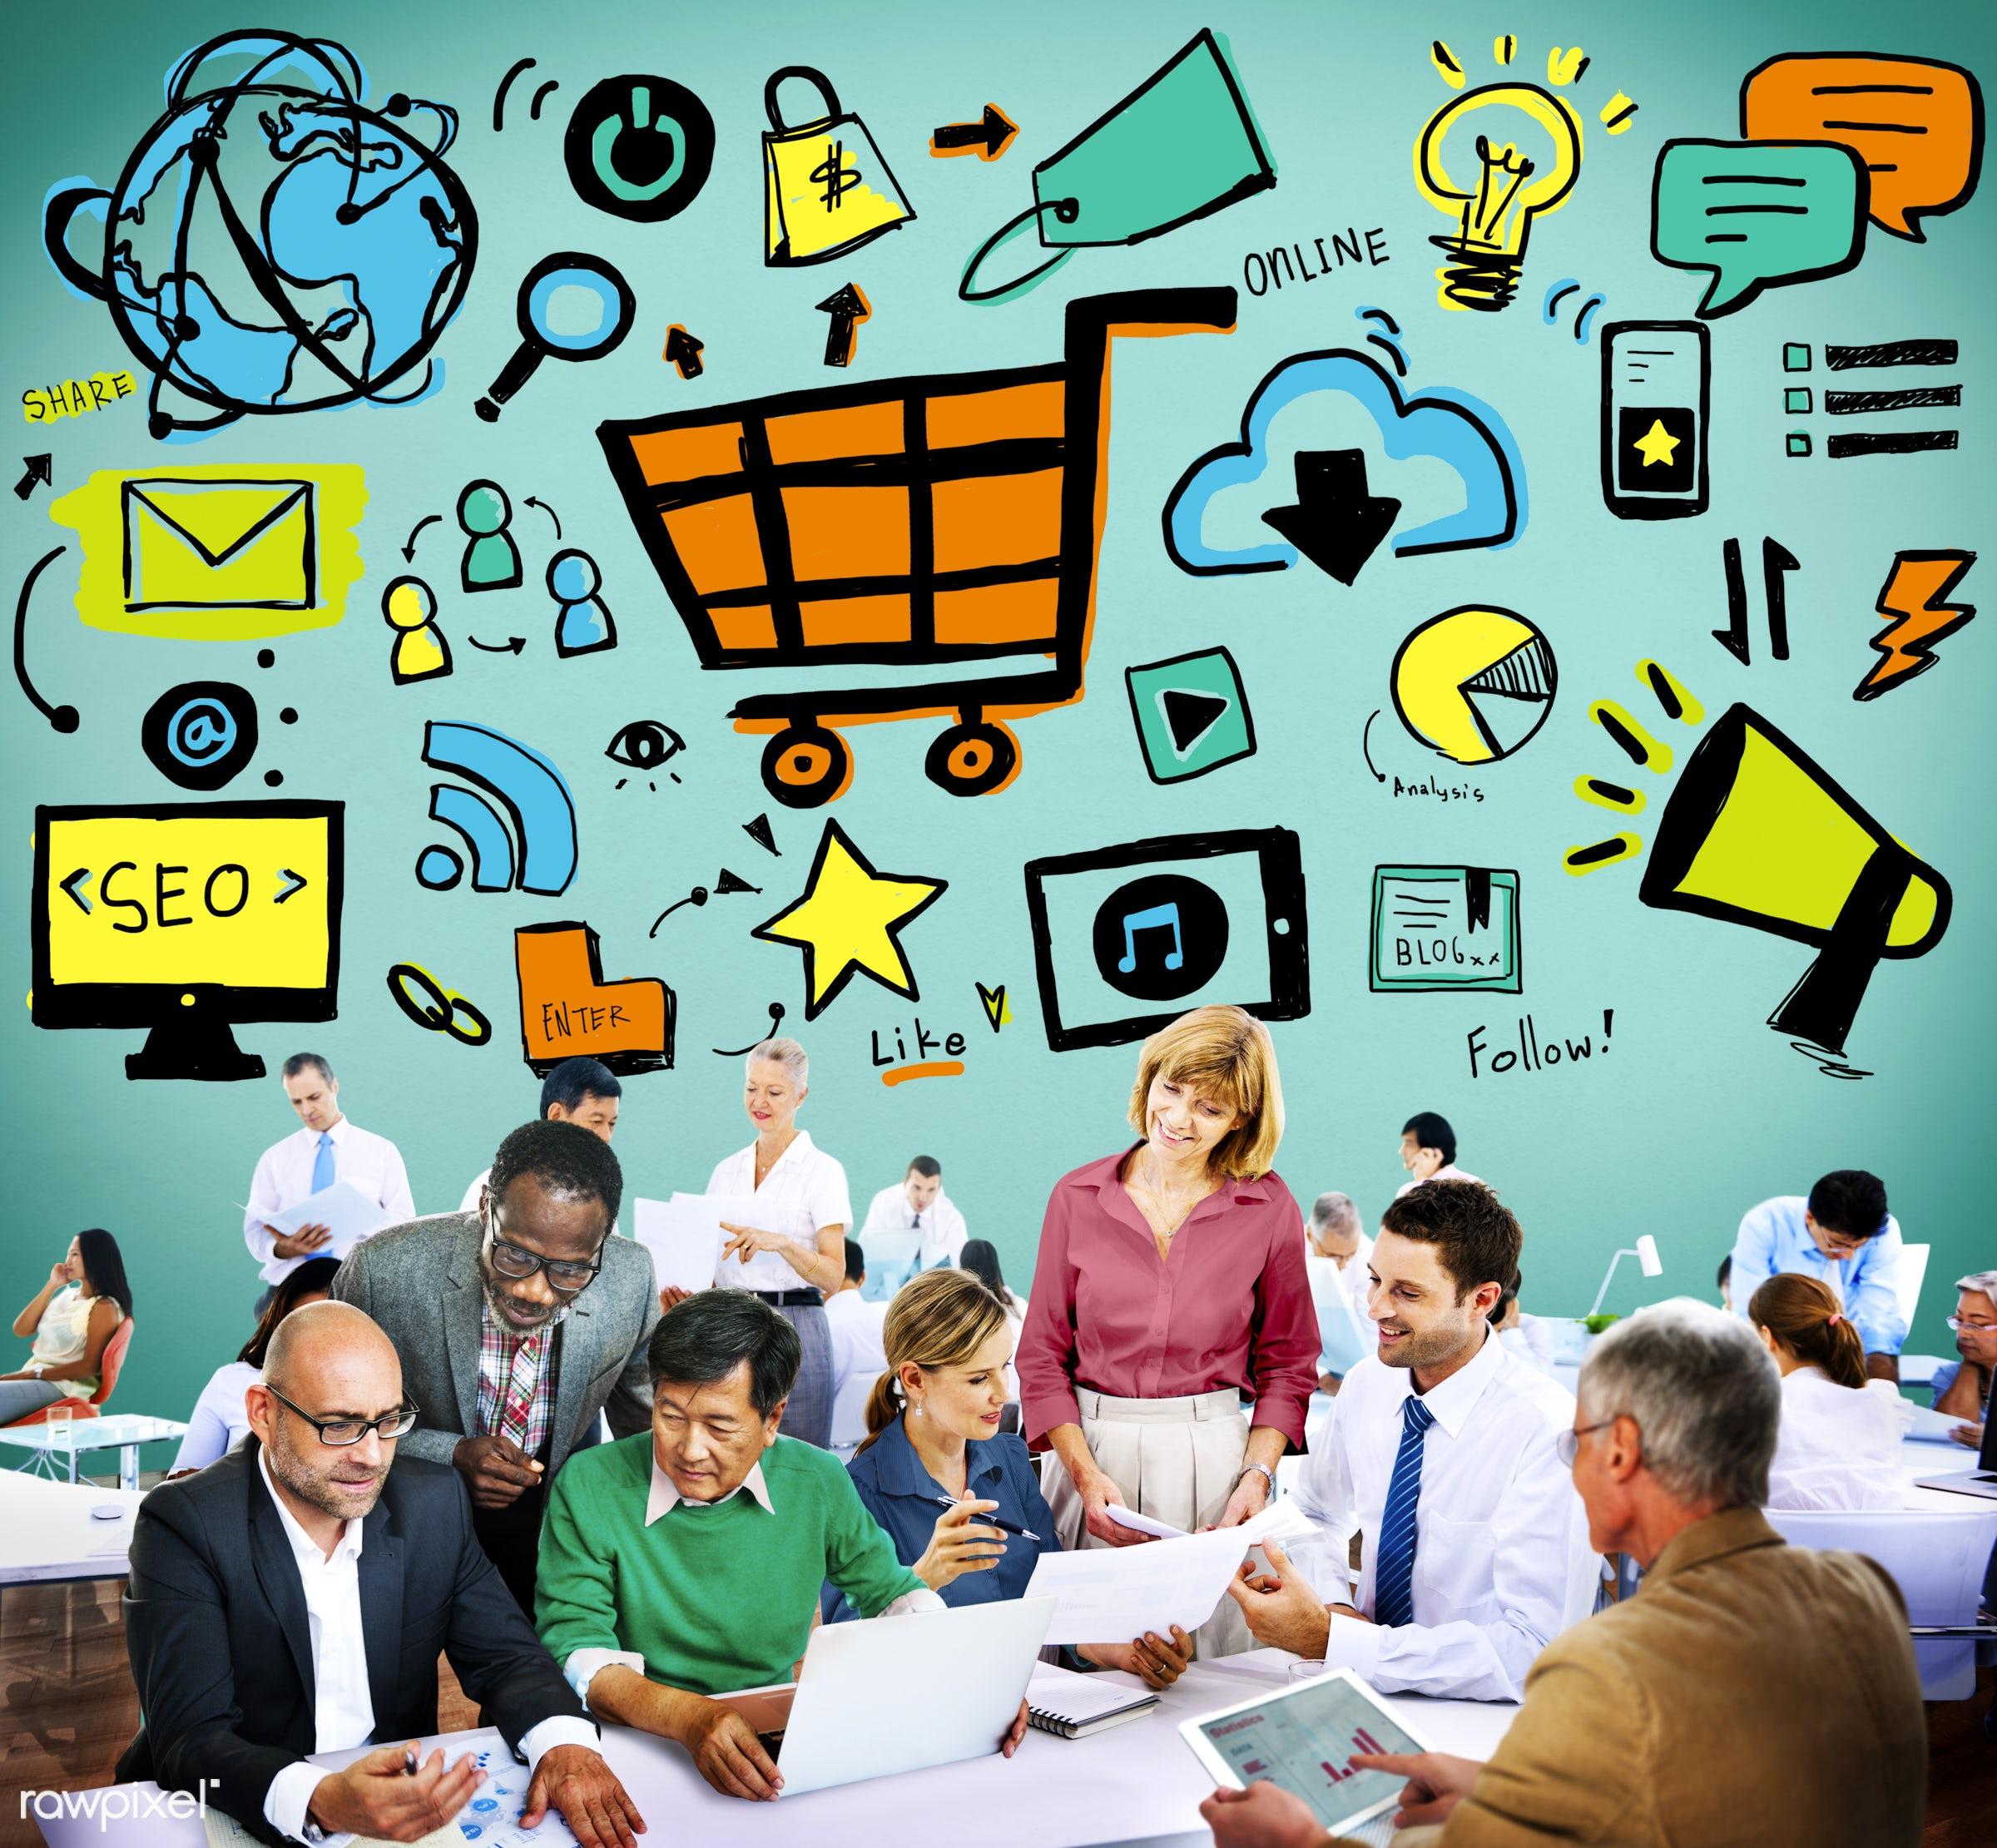 advertising, analysis, brand, branding, business, business people, businessmen, businesswomen, busy, buying, commerce,...